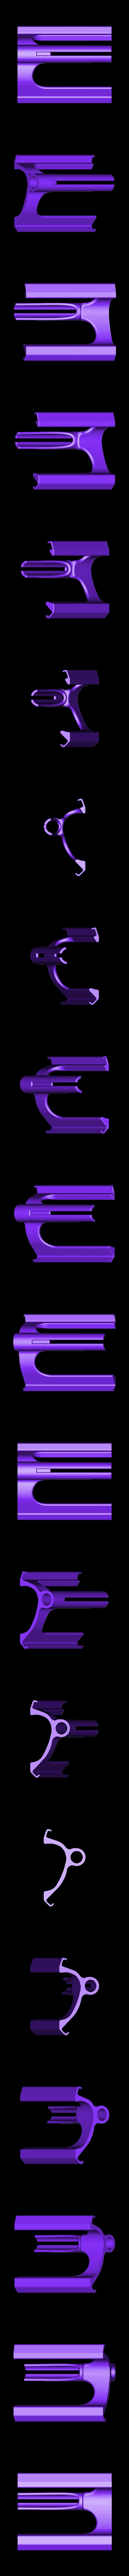 iPad stand III.stl Download free STL file iPad stand Degeba • 3D printing template, Modellismo